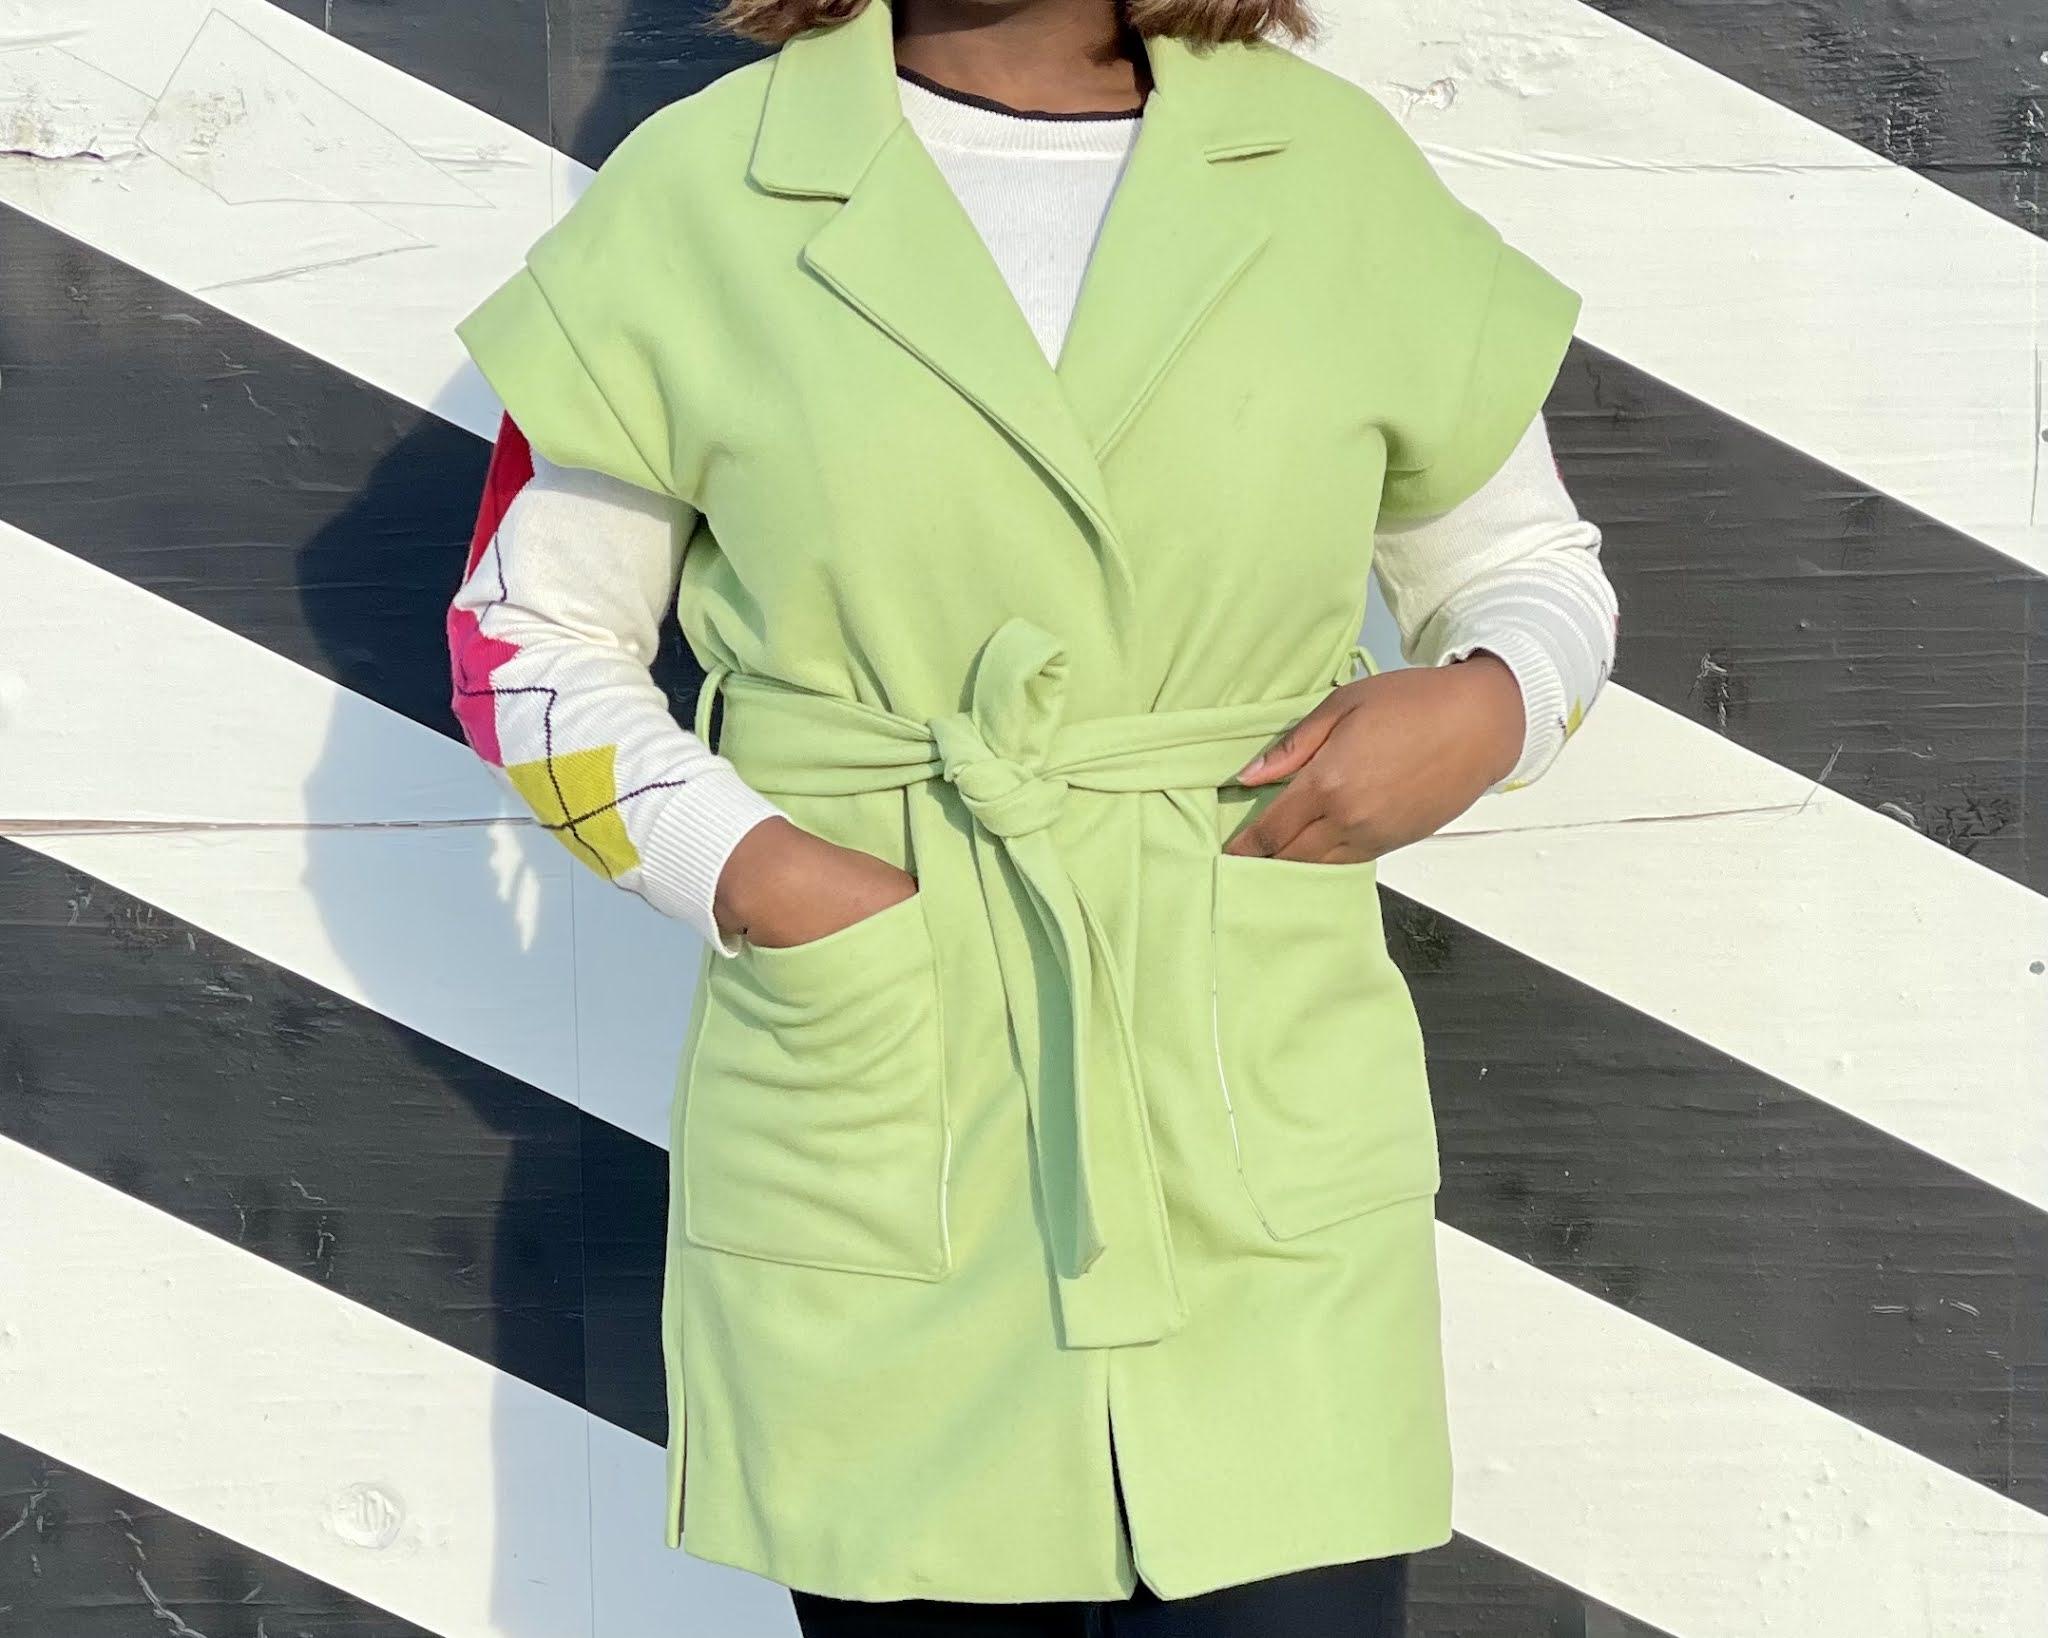 90/'s Spring Green Coat Ladies Pastel Green Vintage Coat Vintage Studio Works Lime Green Zip Up Spring Jacket Women/'s Chartreuse Jacket